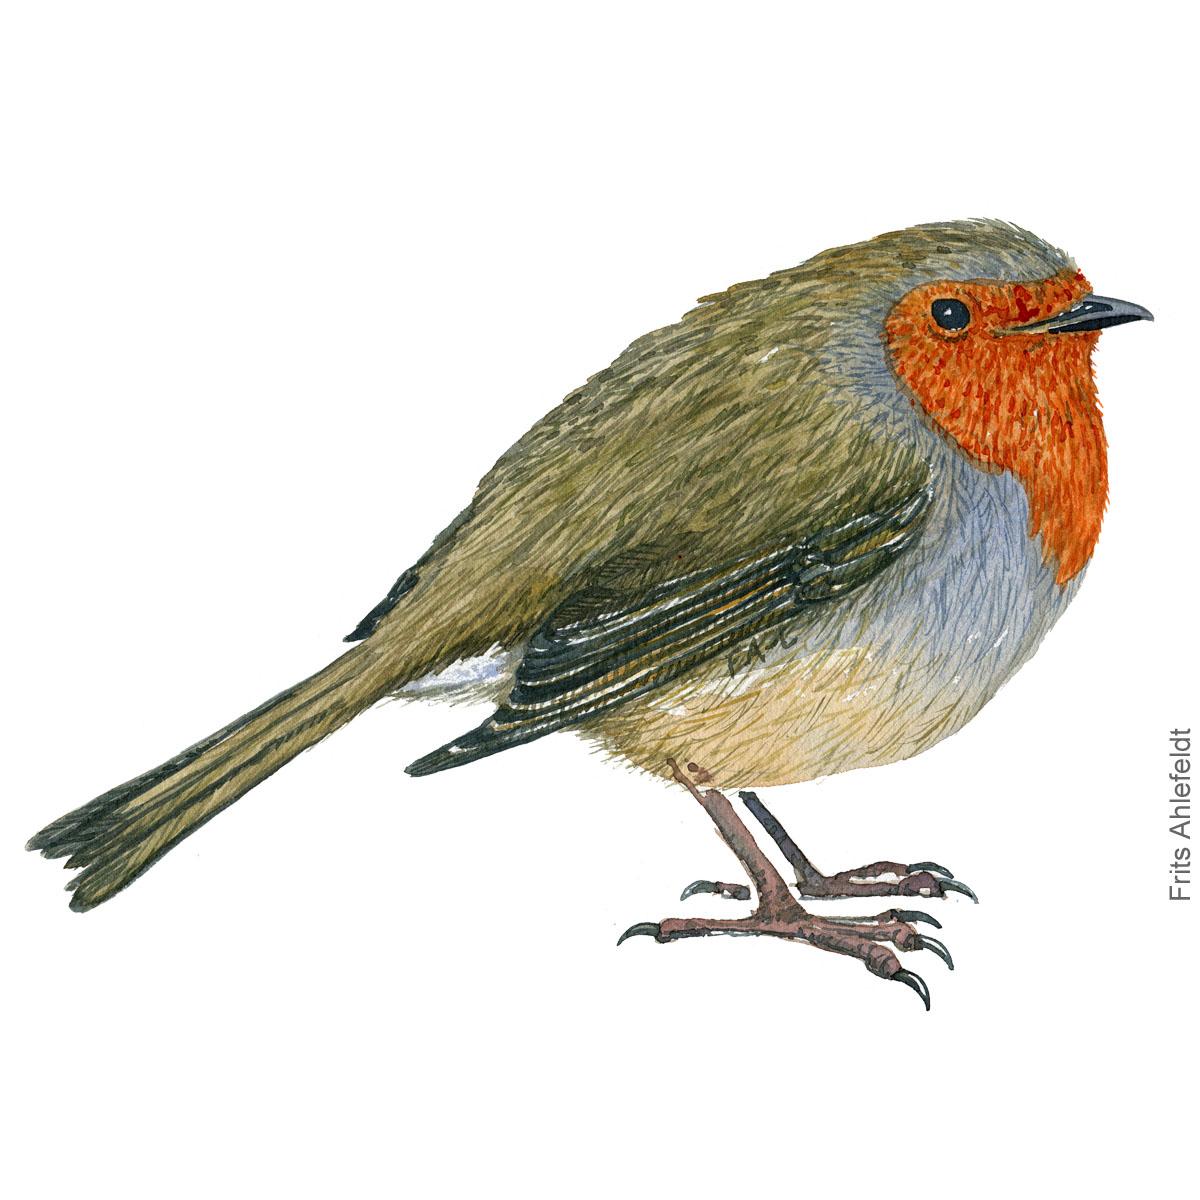 Rødhals - European robin bird watercolor illustration. Artwork by Frits Ahlefeldt. Fugle akvarel